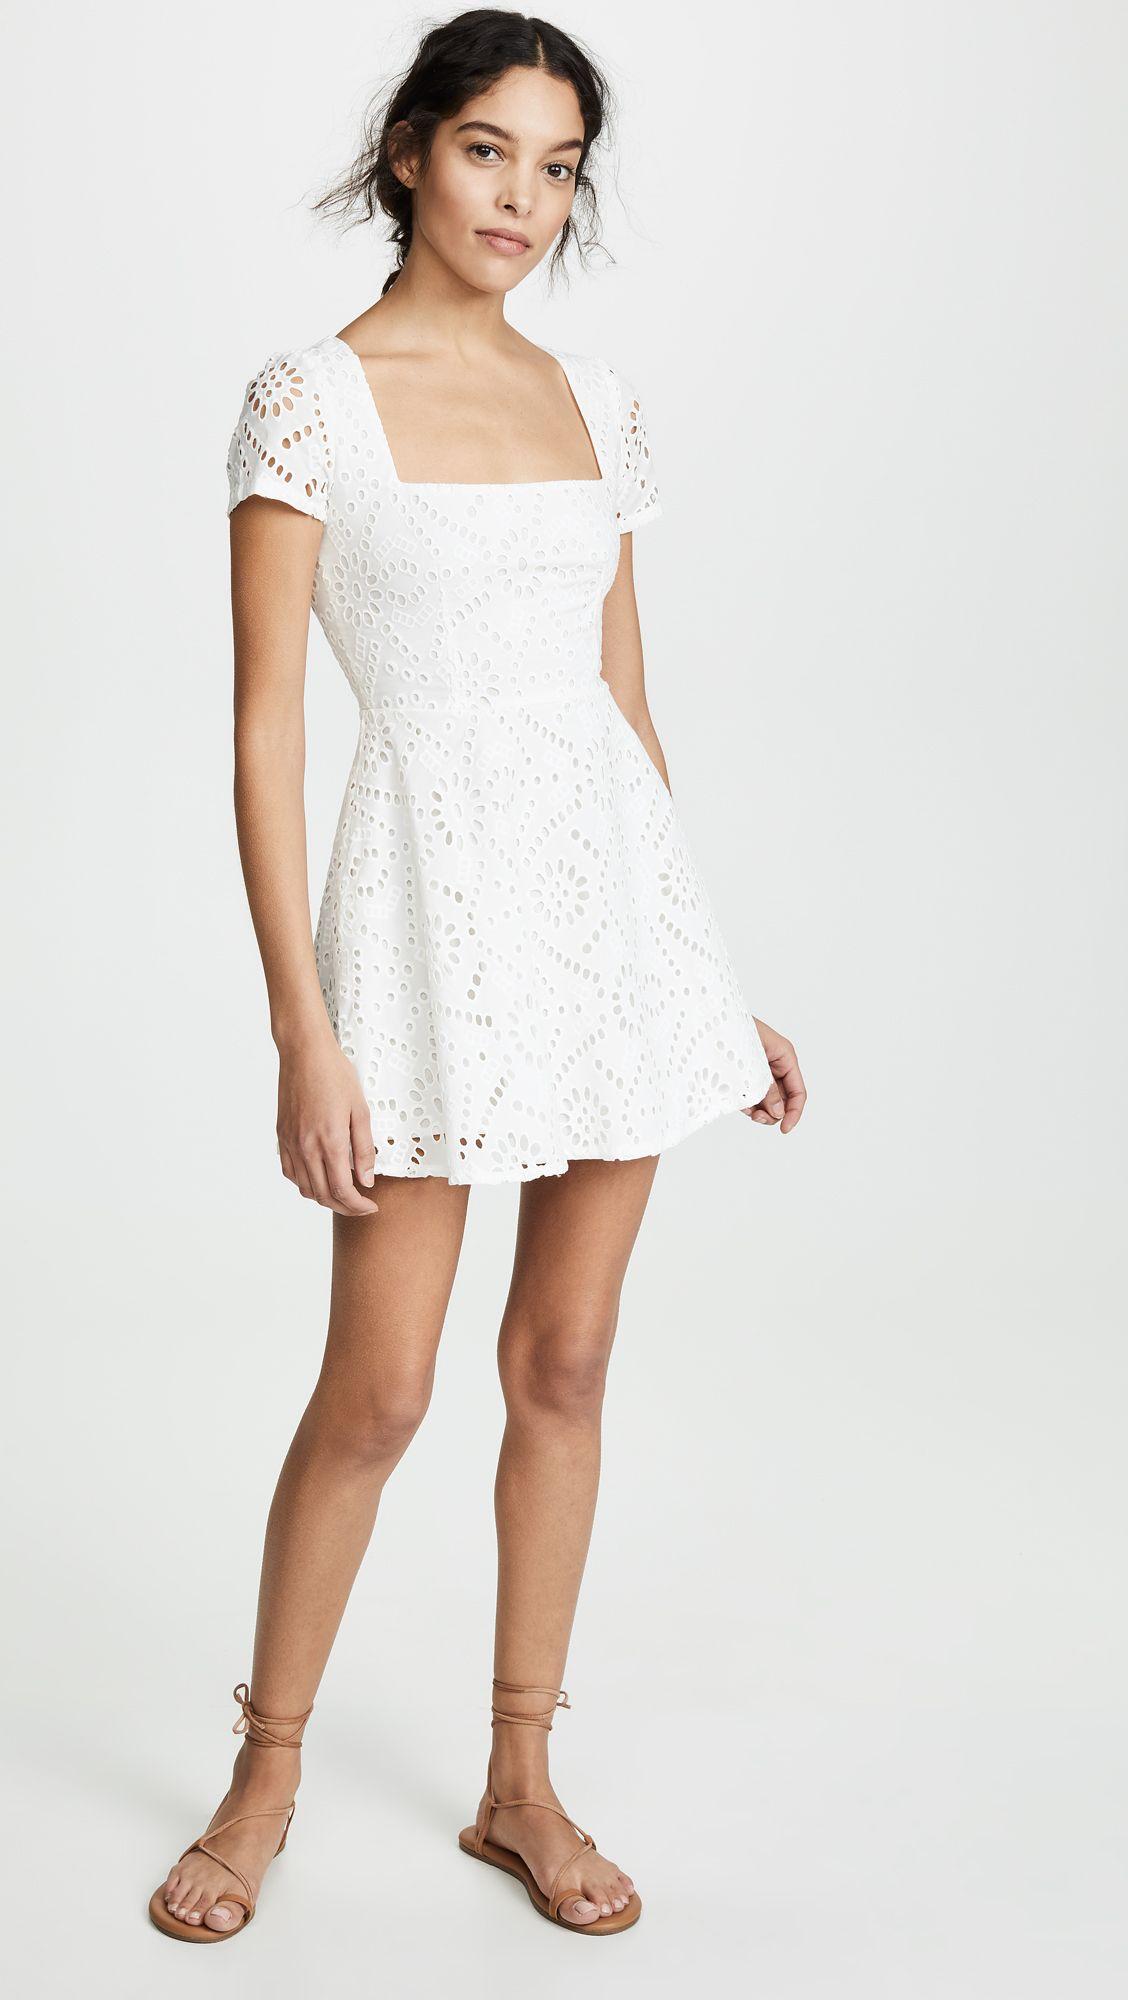 ea3fbc817824 Maiden Mini Dress in 2019 | Class | Dresses, White dress, Mini